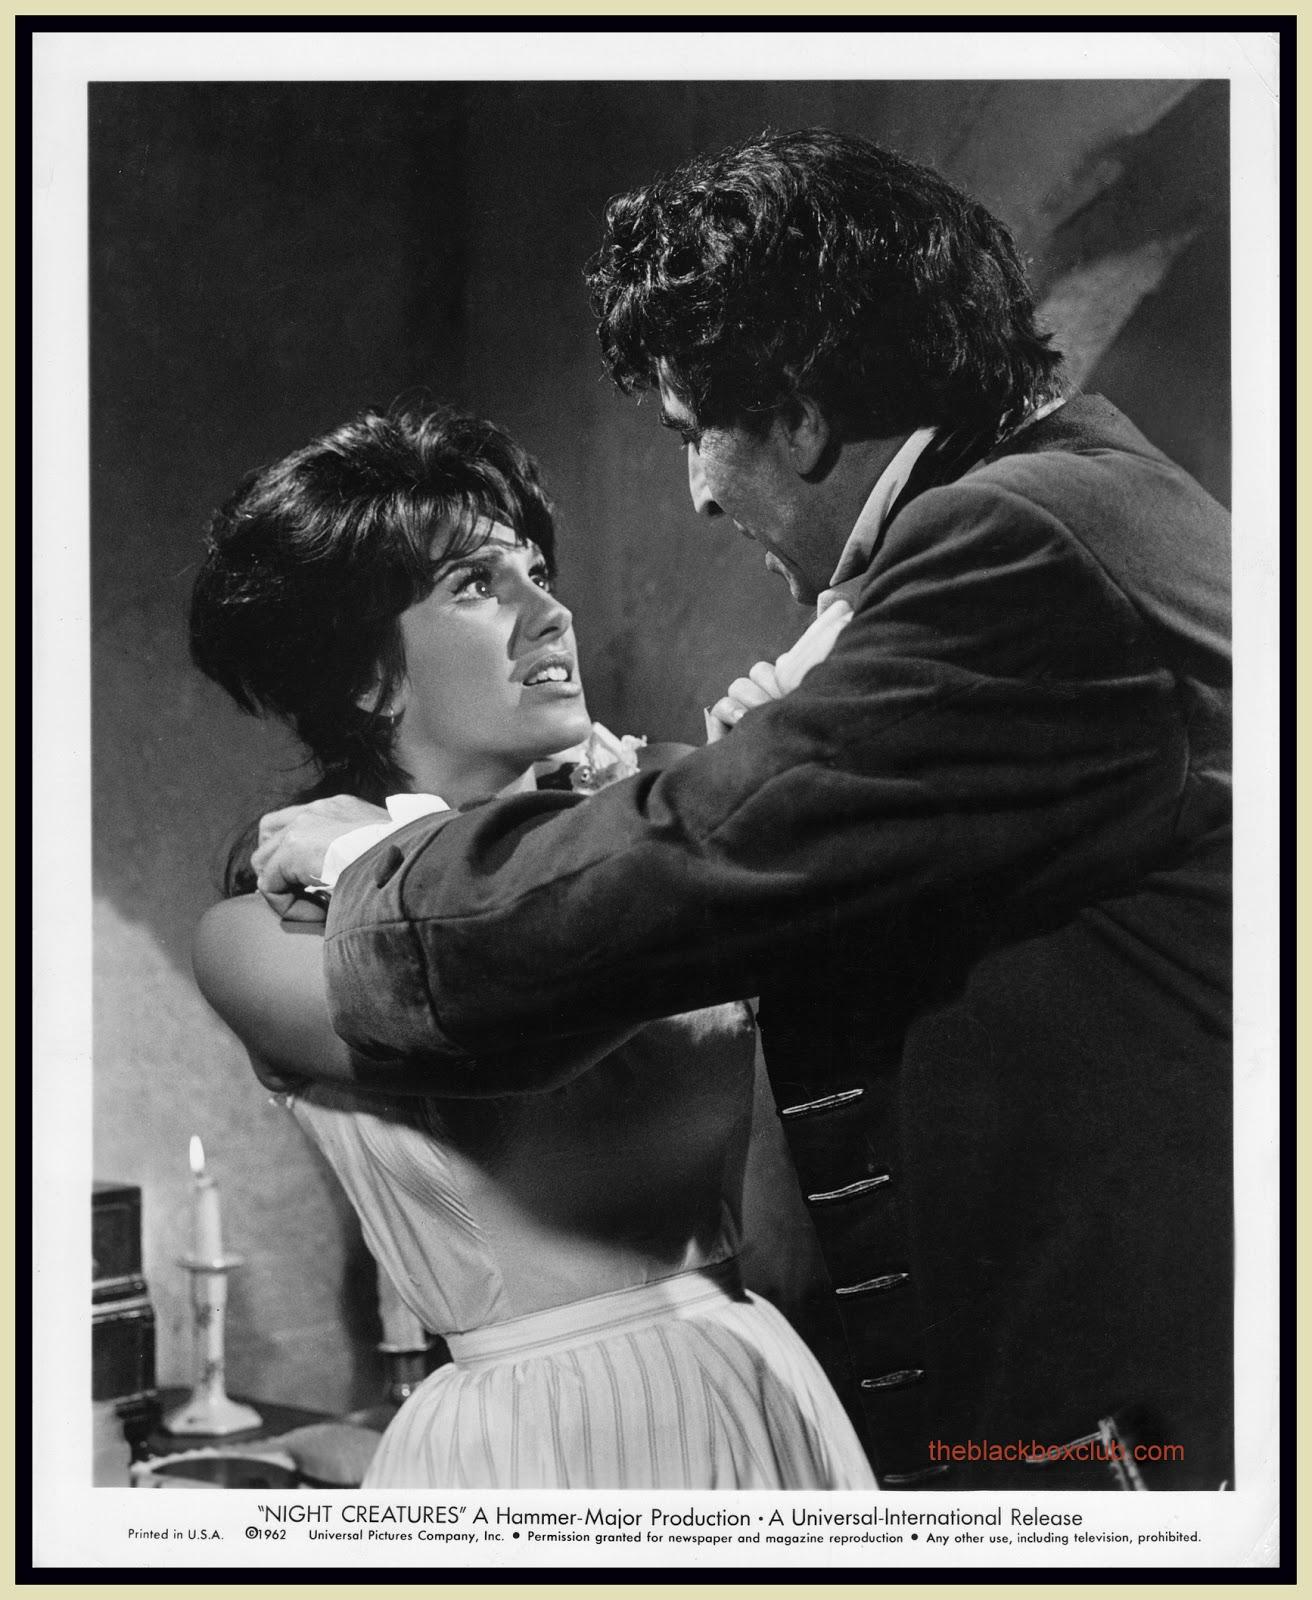 Samantha Janus (born 1972),Laura Michelle Kelly Erotic fotos Malcolm McDowell (born 1943),Dana Gillespie